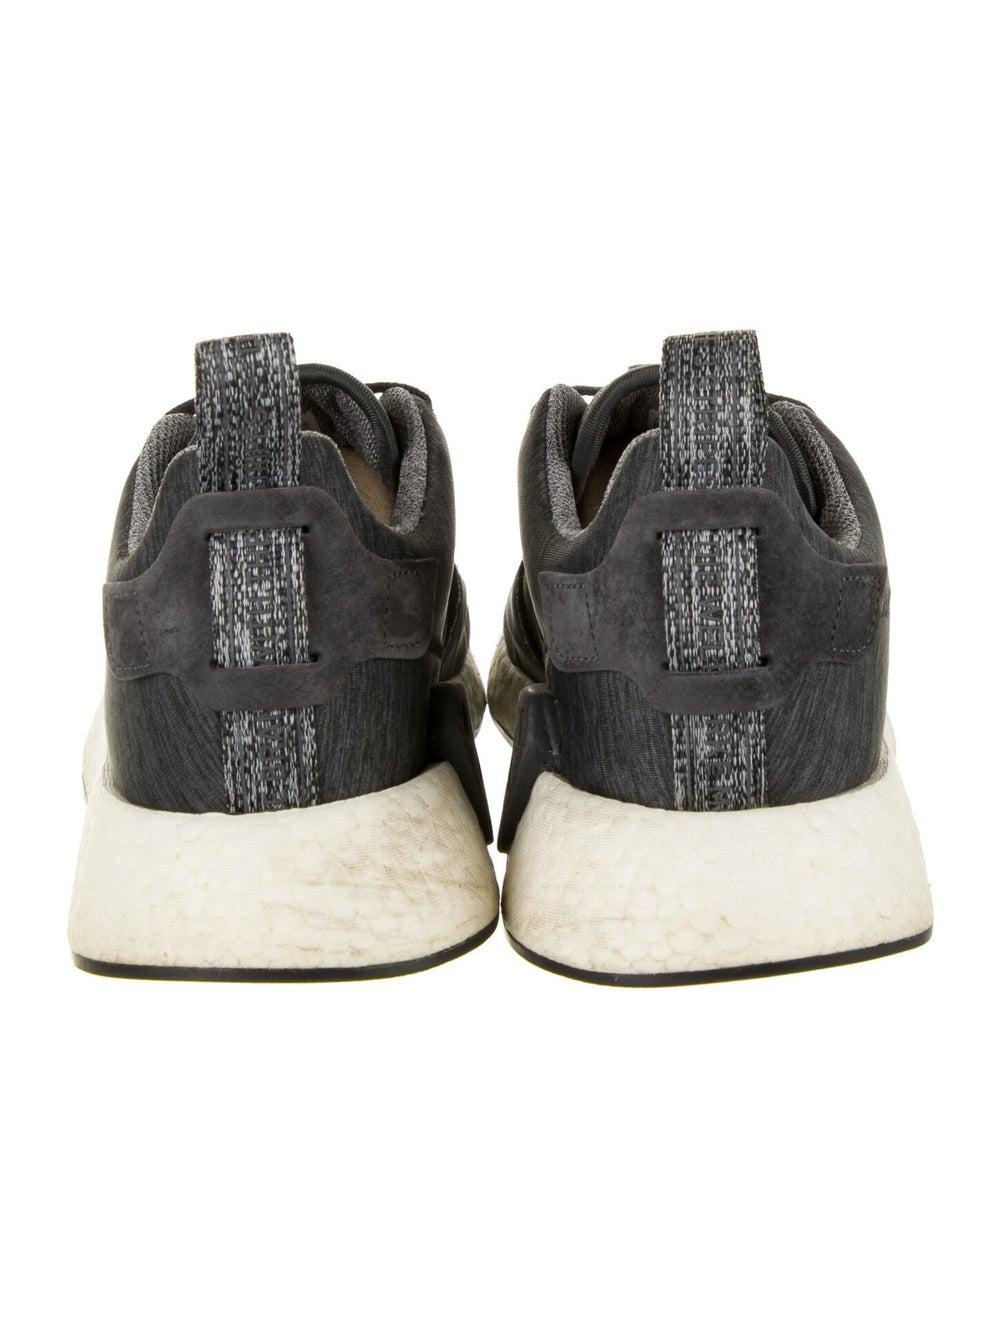 Adidas Athletic Sneakers Grey - image 4